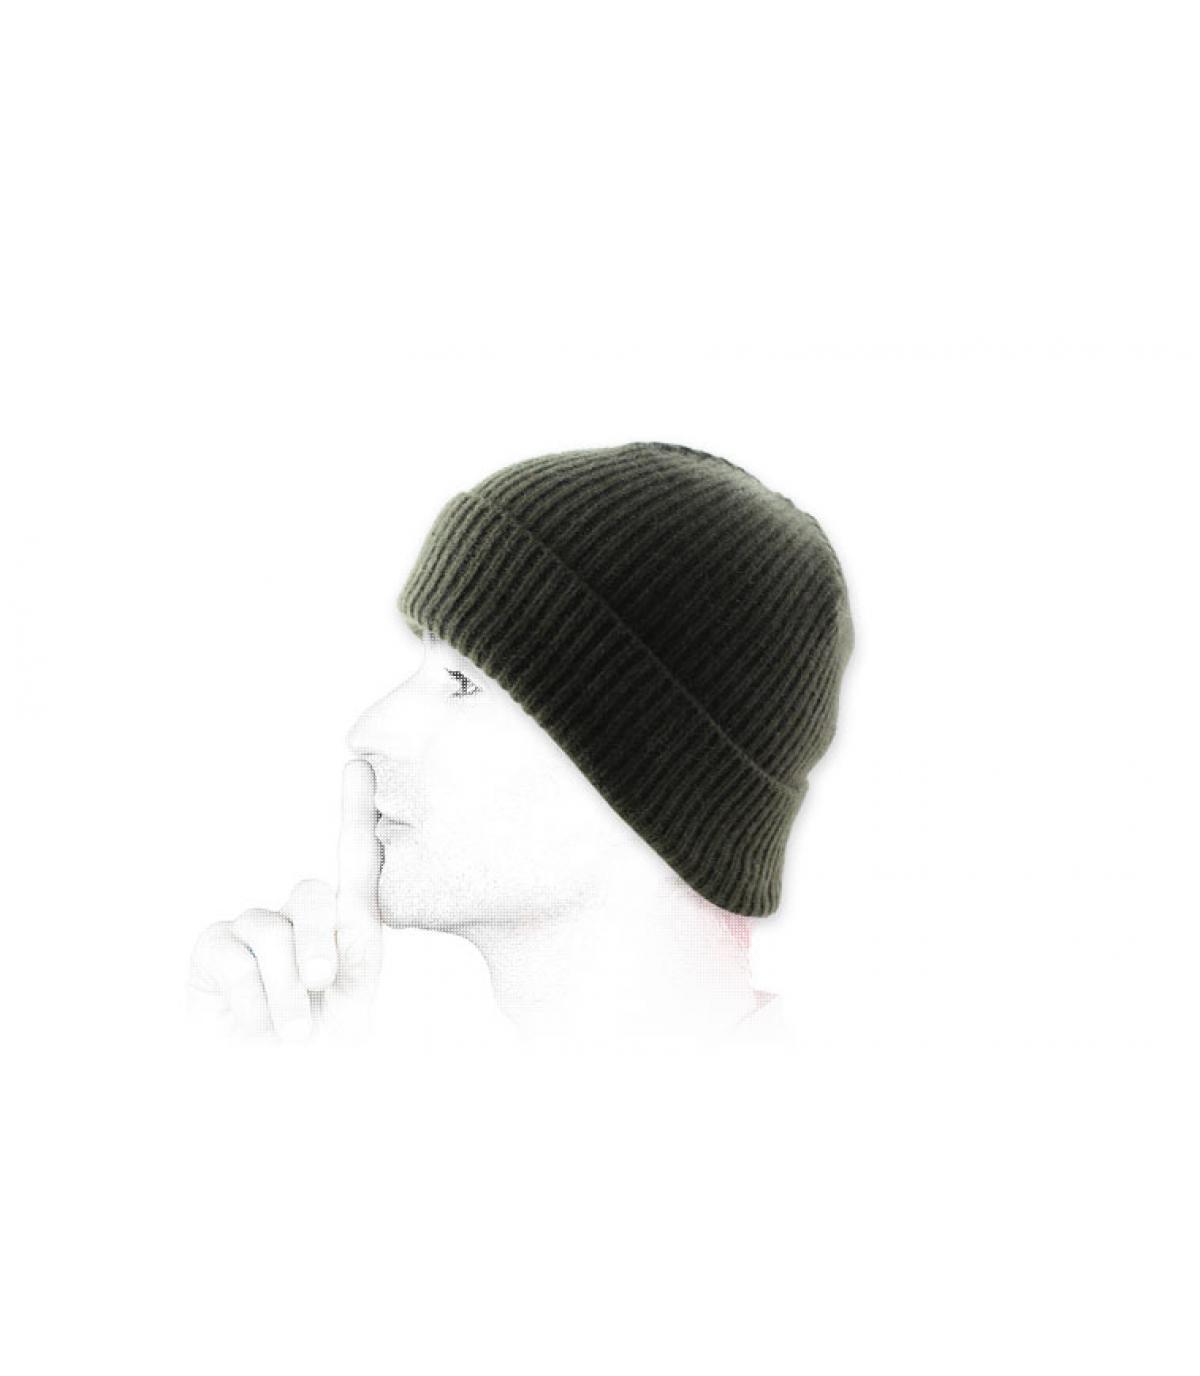 Mütze Revers Wolle grün